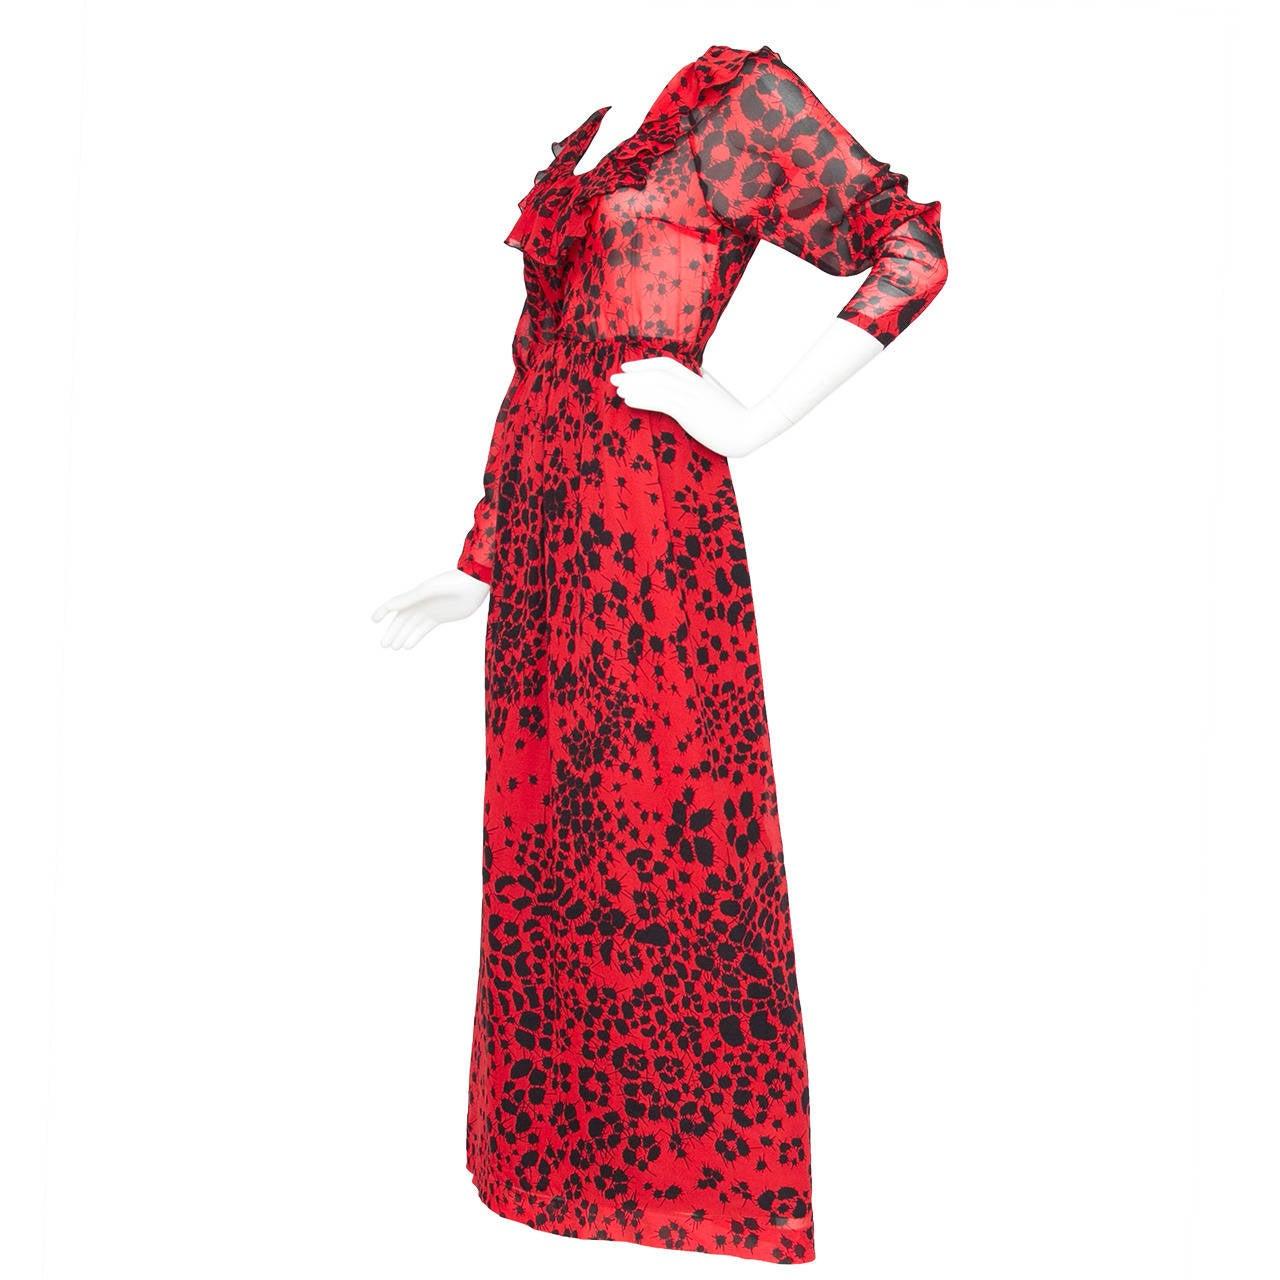 Dramatic 1970s Lanvin Red Silk Dress